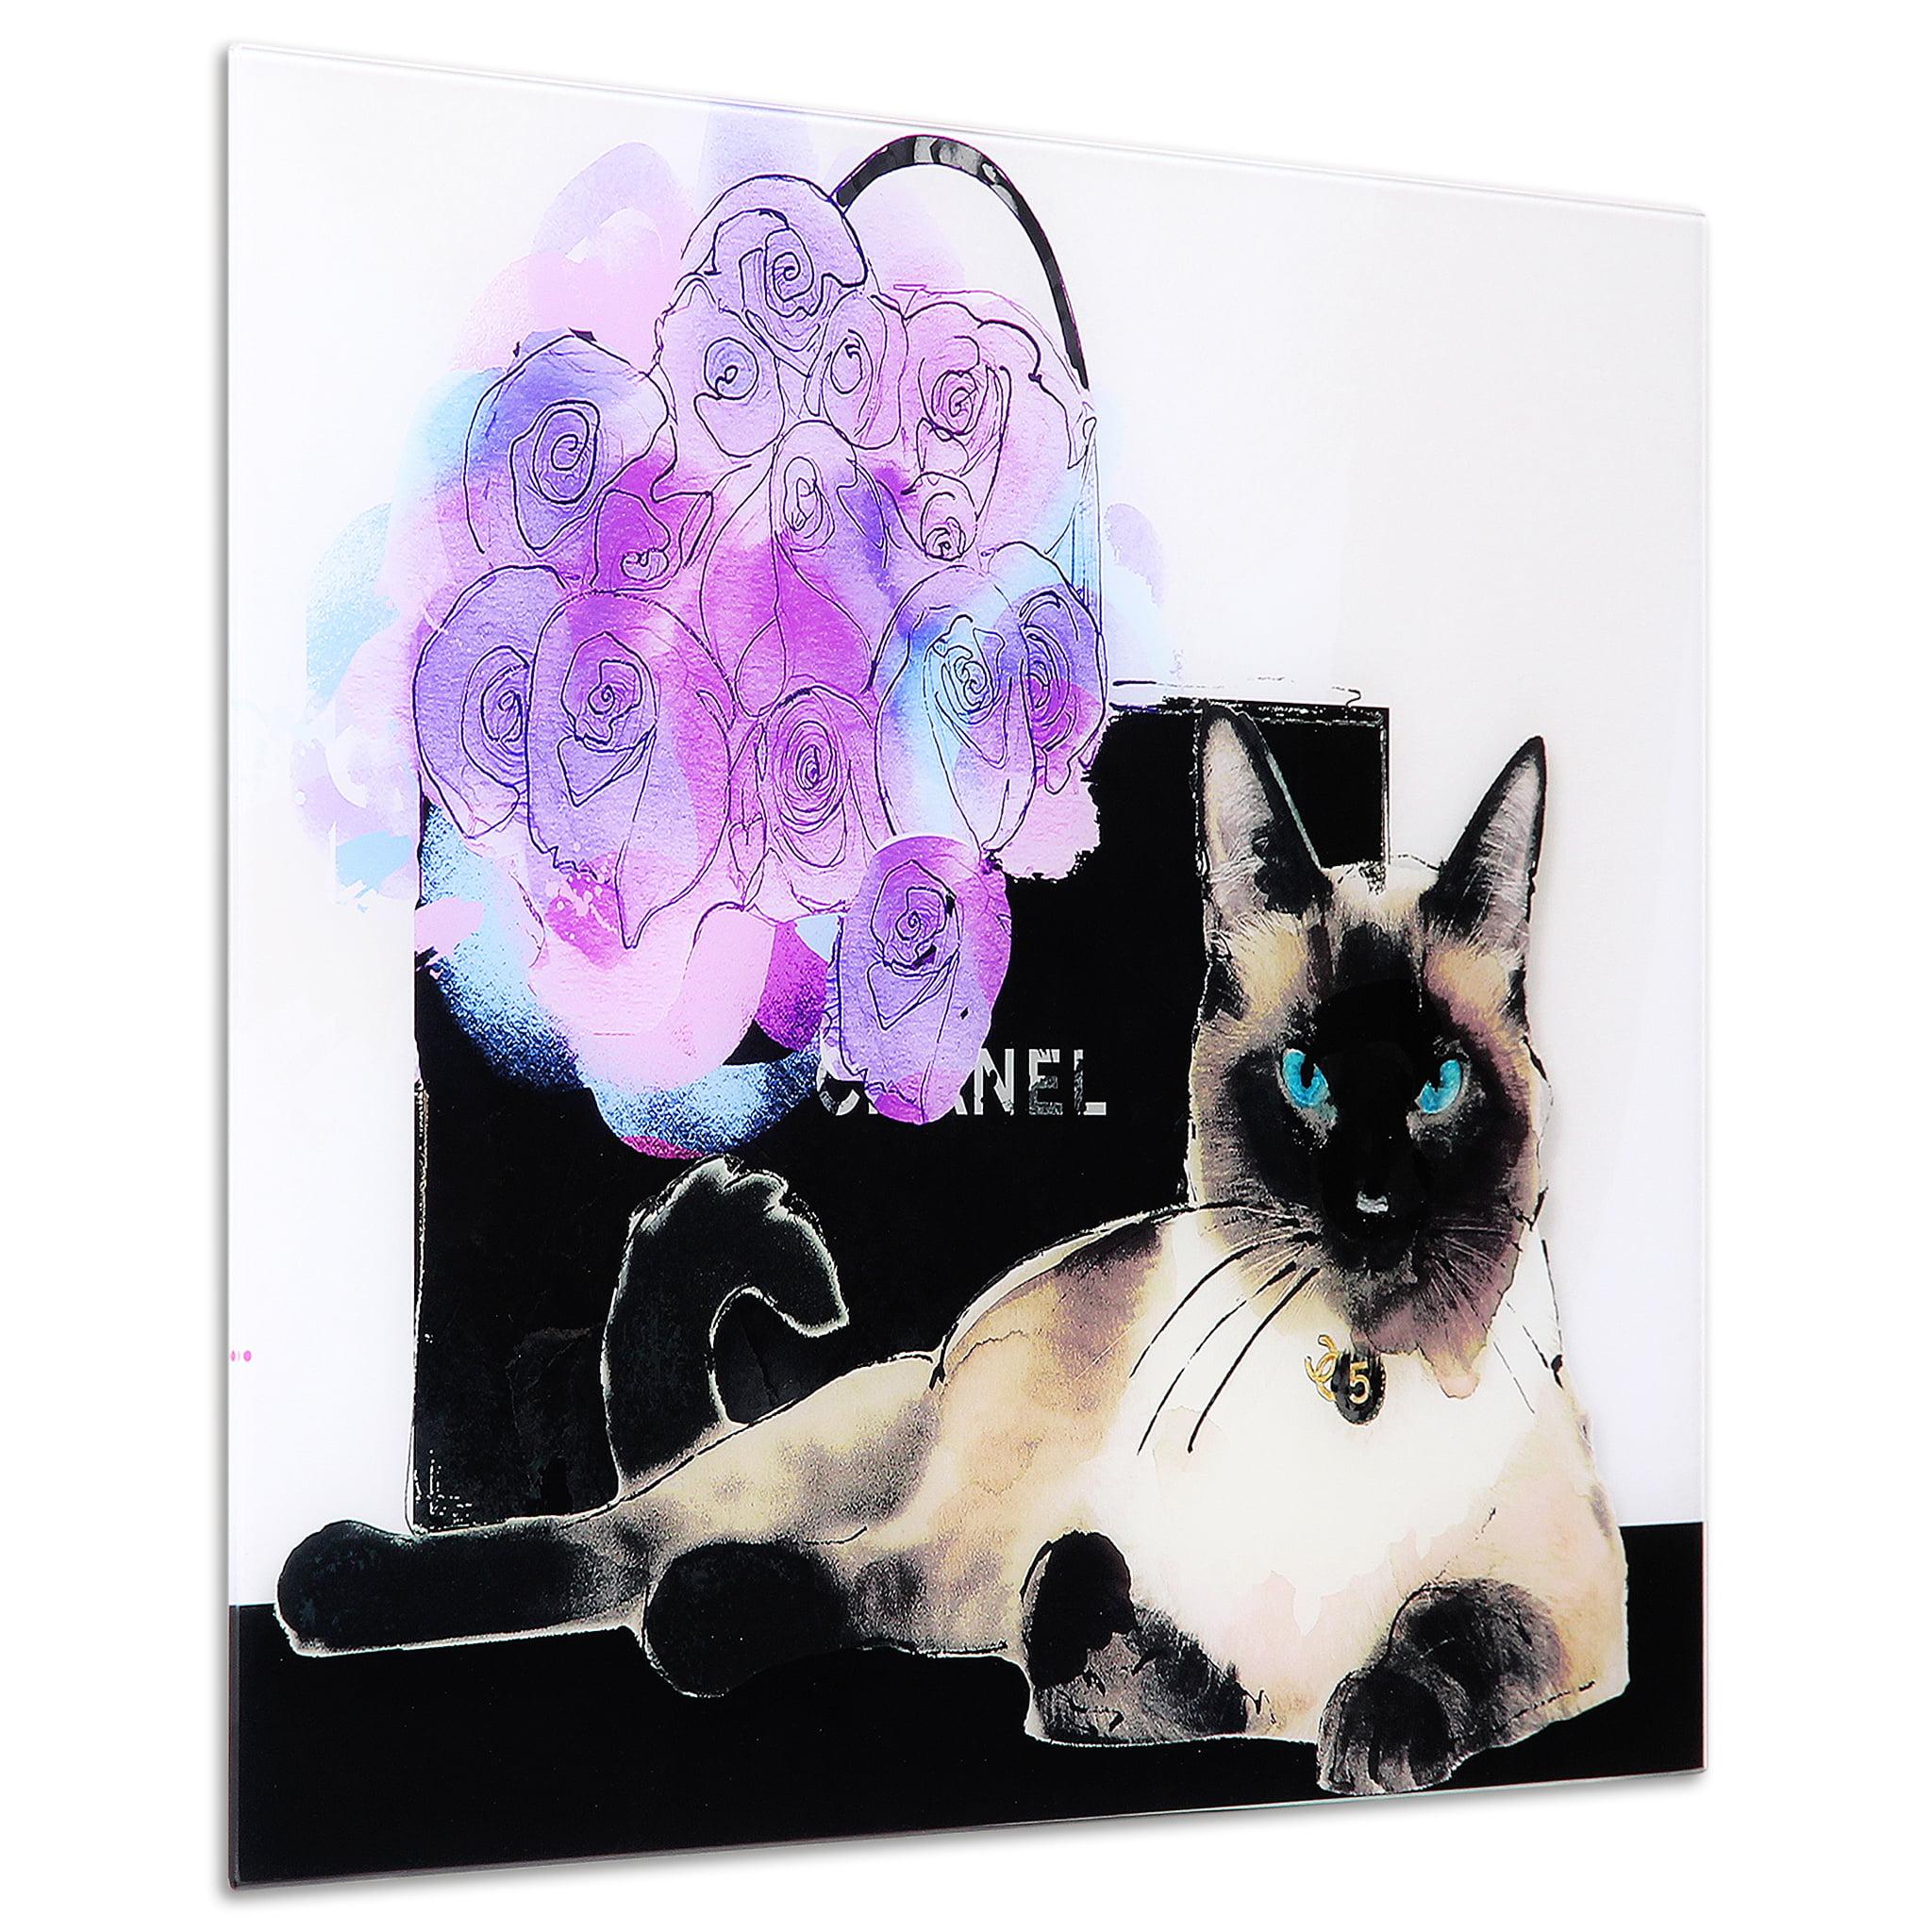 Empire Art Direct Lilac Bouquet Frameless Free Floating Tempered Glass Panel Graphic Cat Wall Art 24 X 16 Ready To Hang Walmart Com Walmart Com